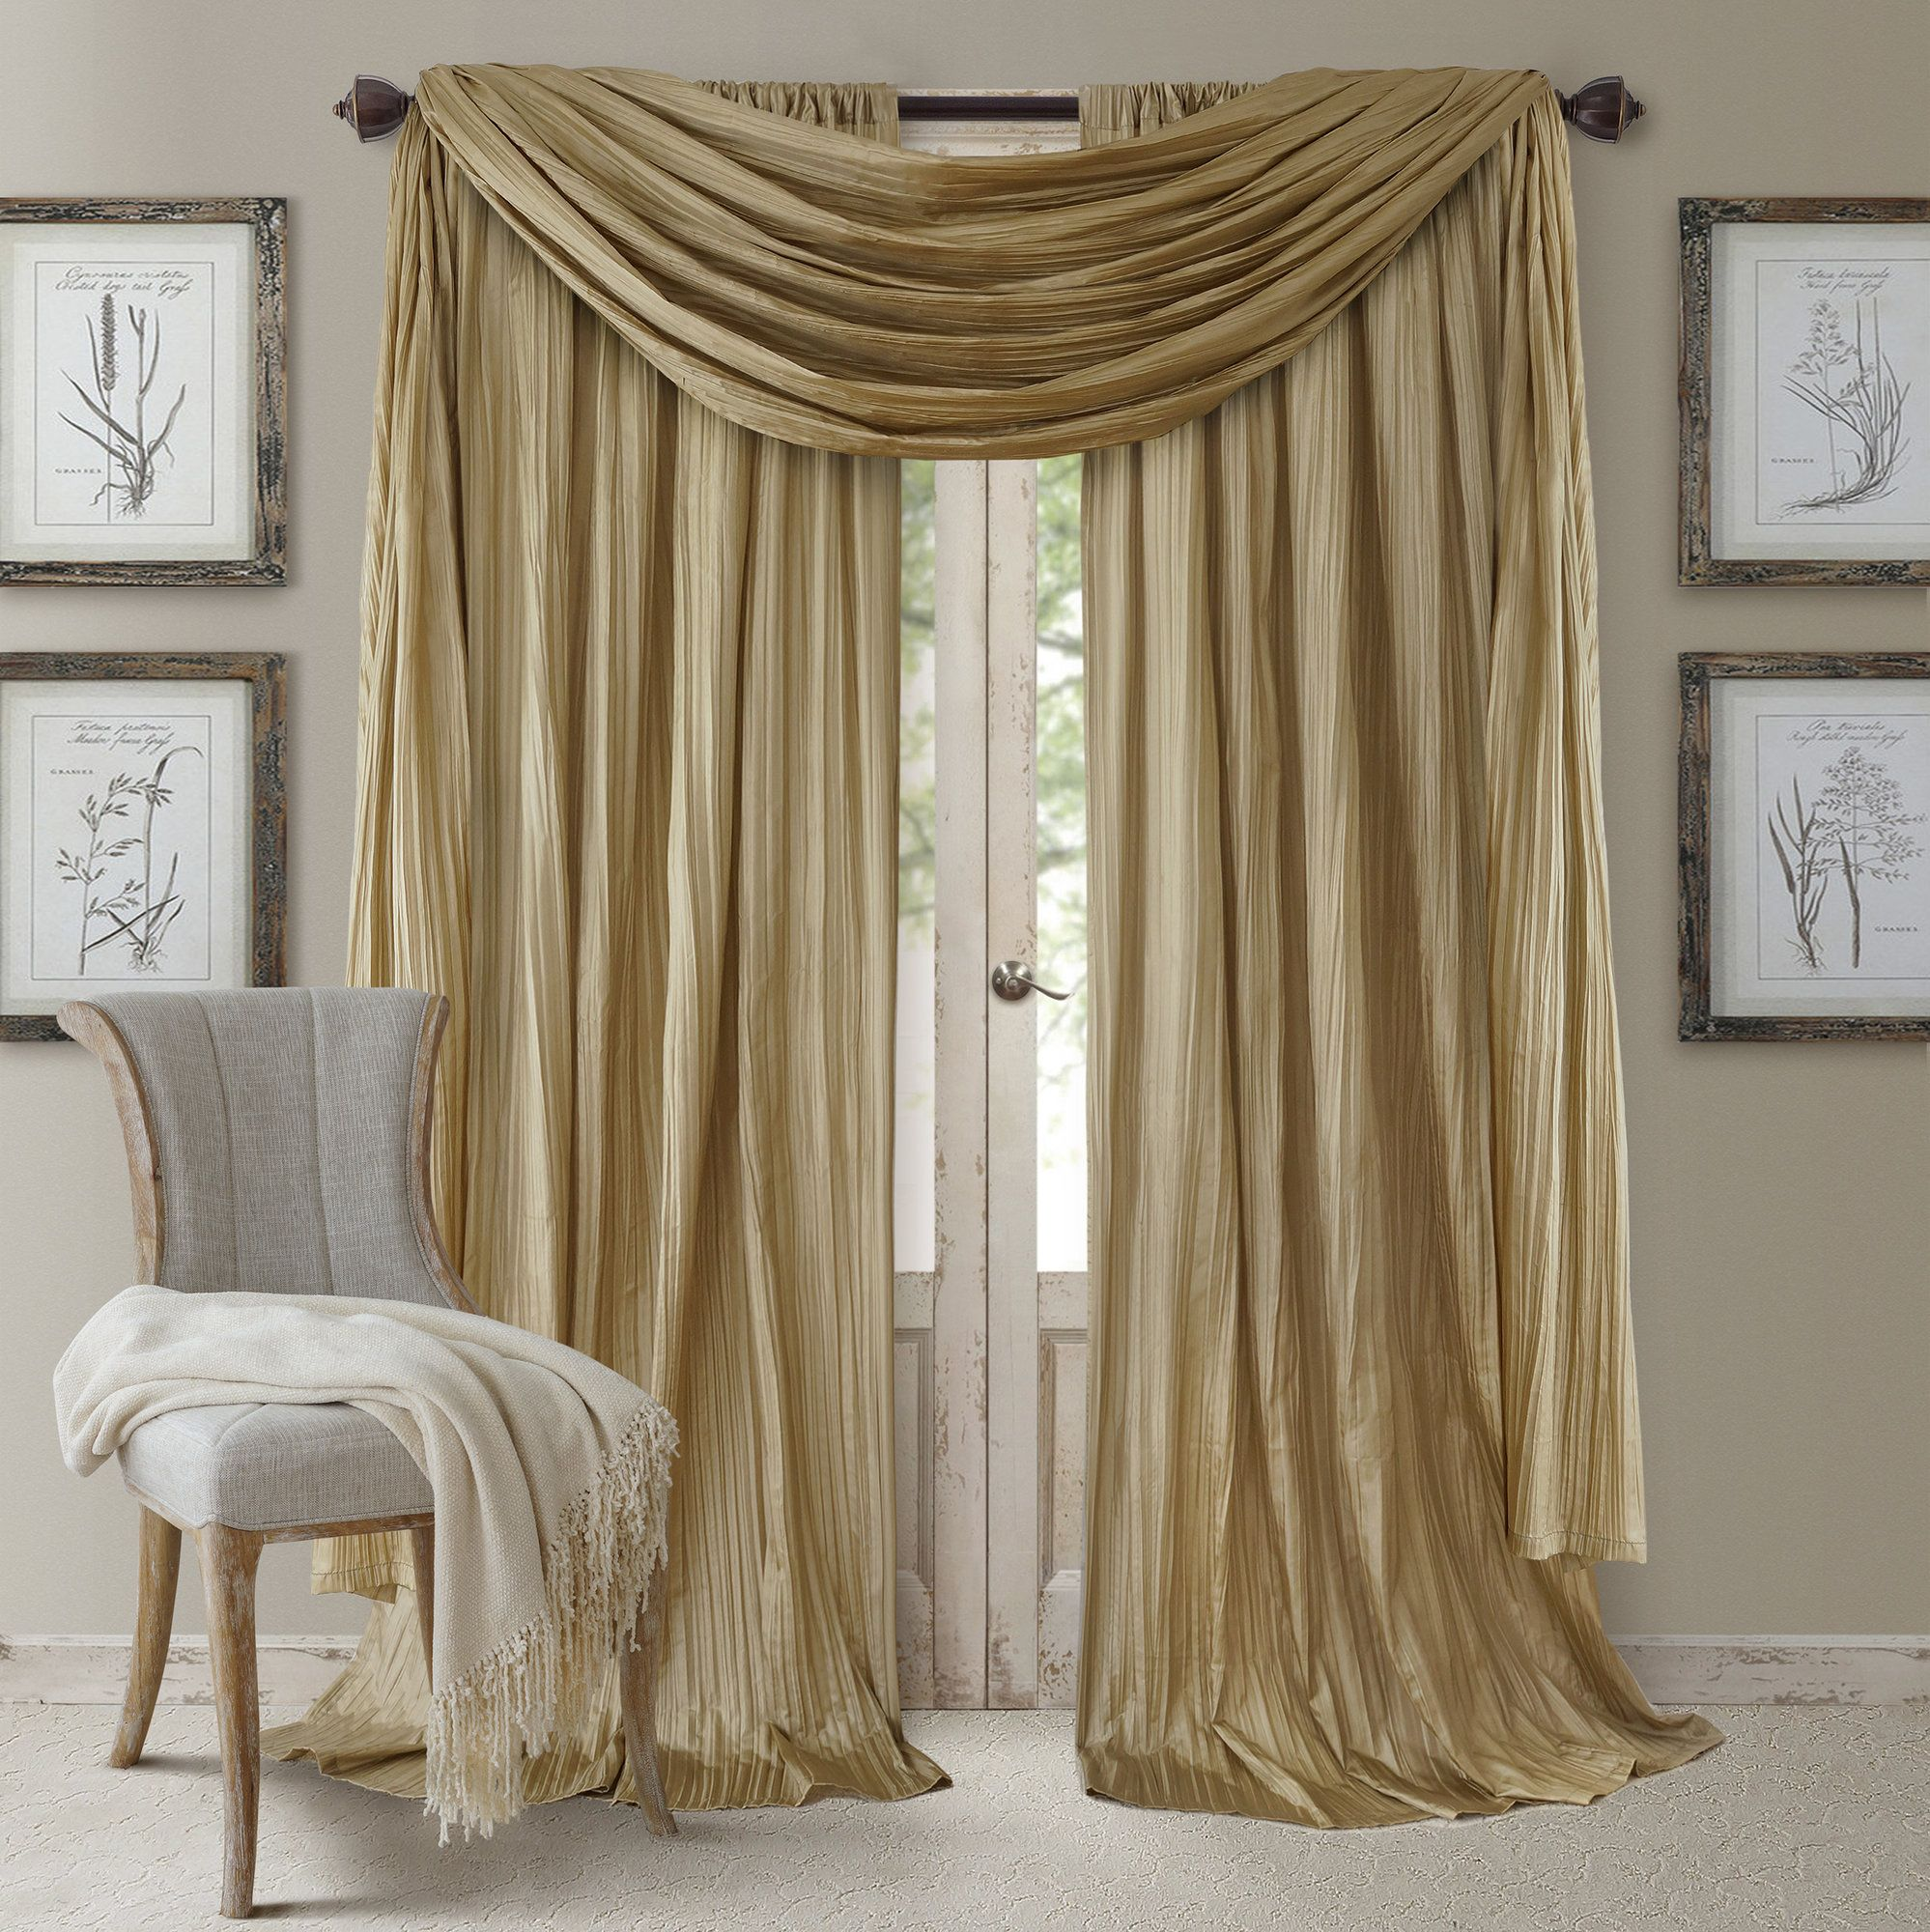 Onna Window Treatment Set | Products | Pinterest | Decoracion con ...